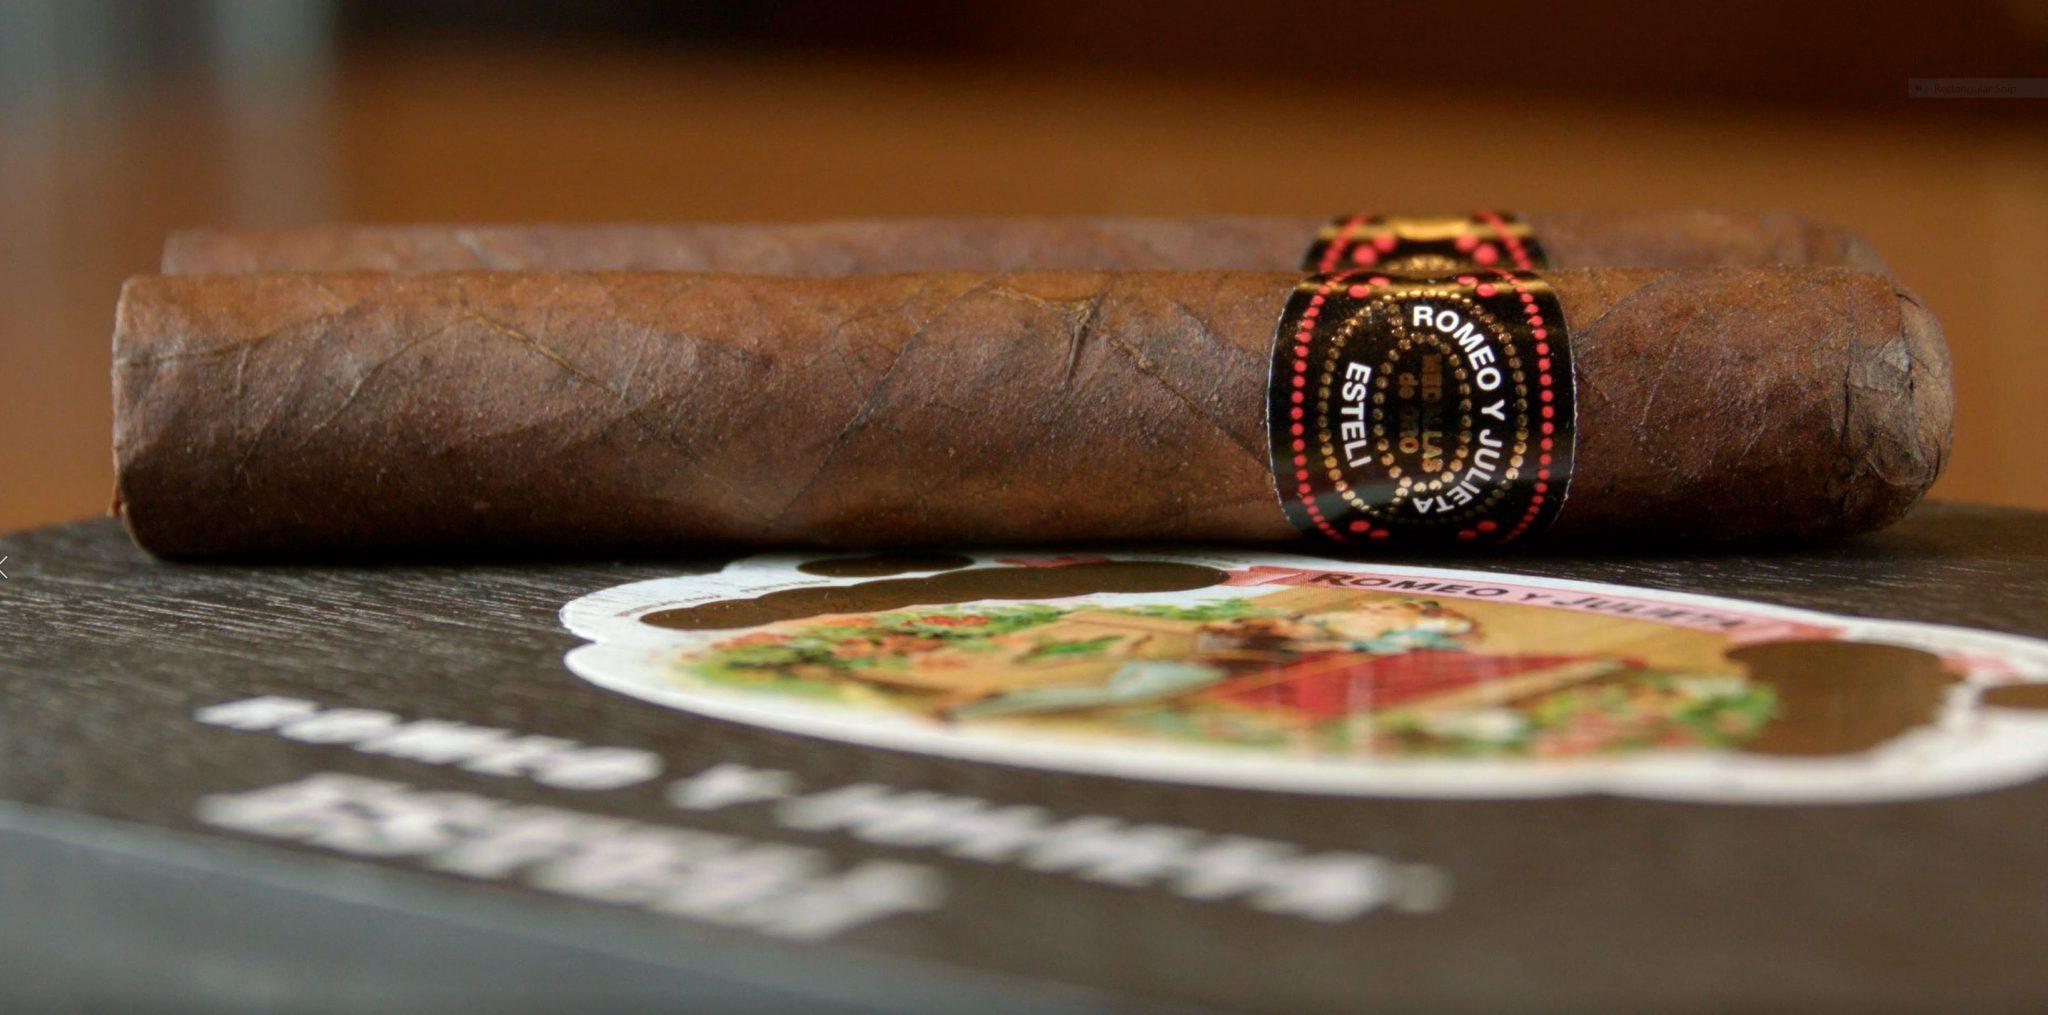 Romeo y Julieta Esteli cigar review box image 2